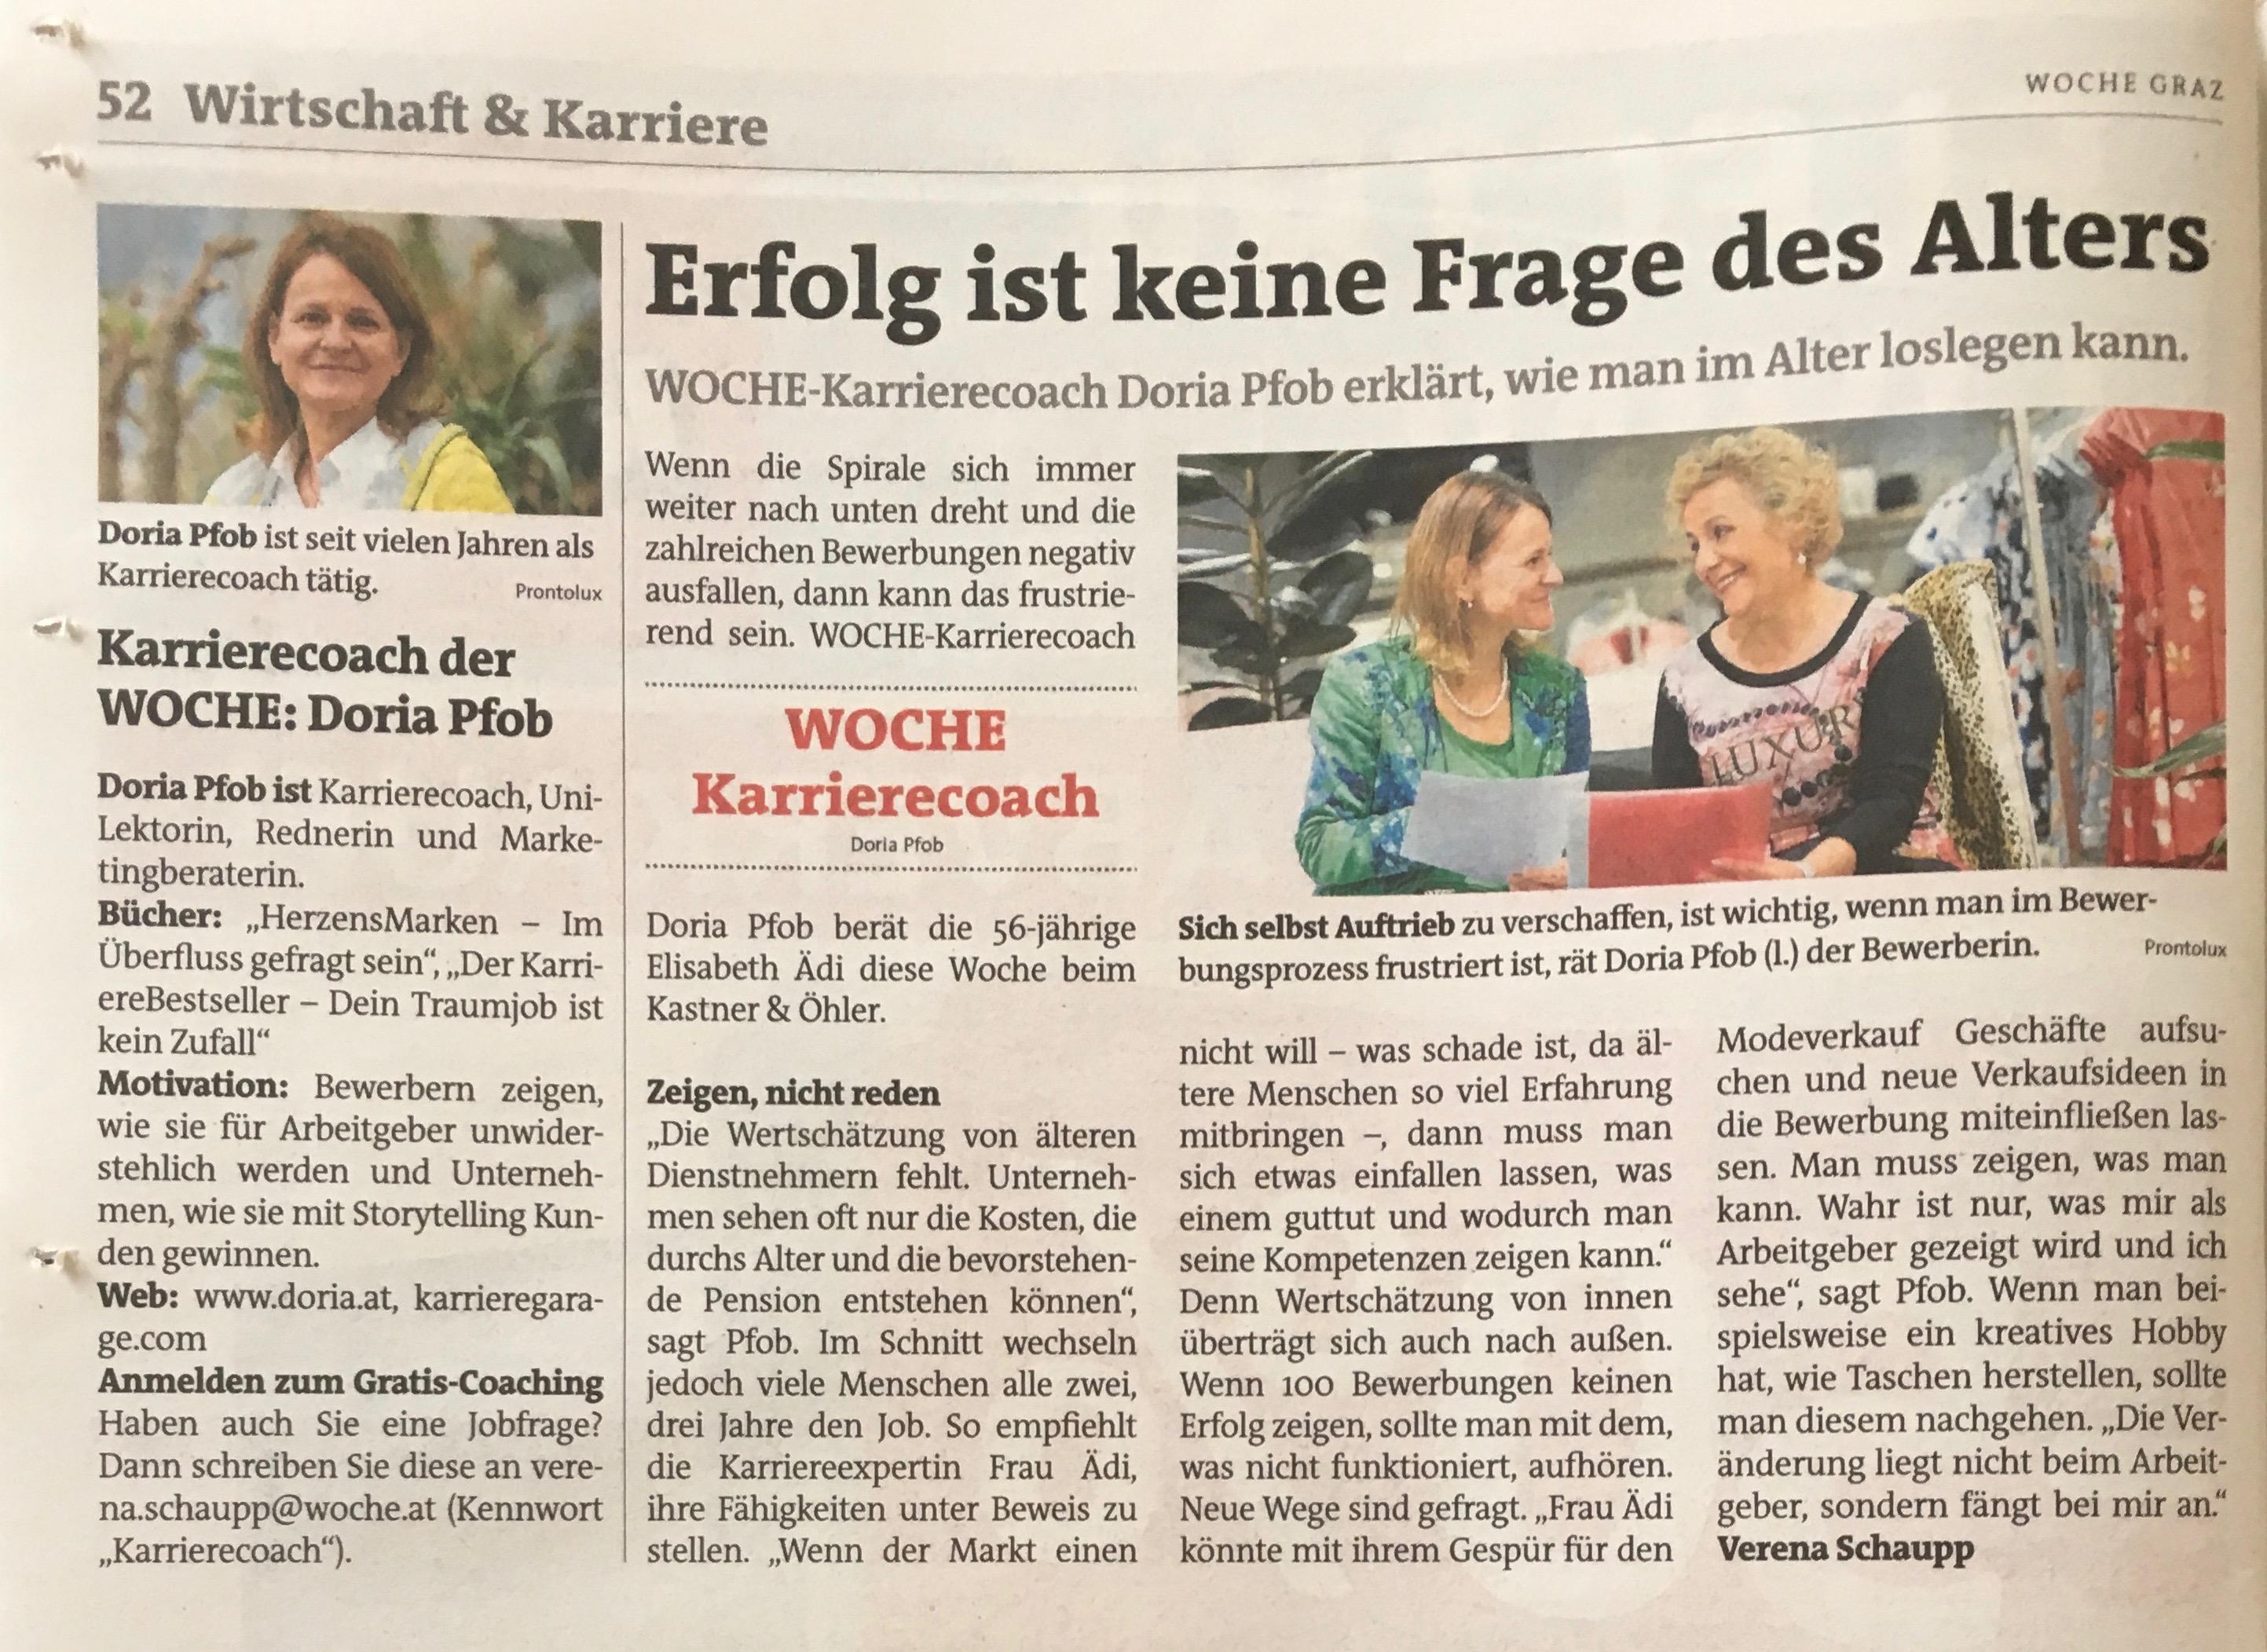 Doria Pfob Karrierecoach Woche2017